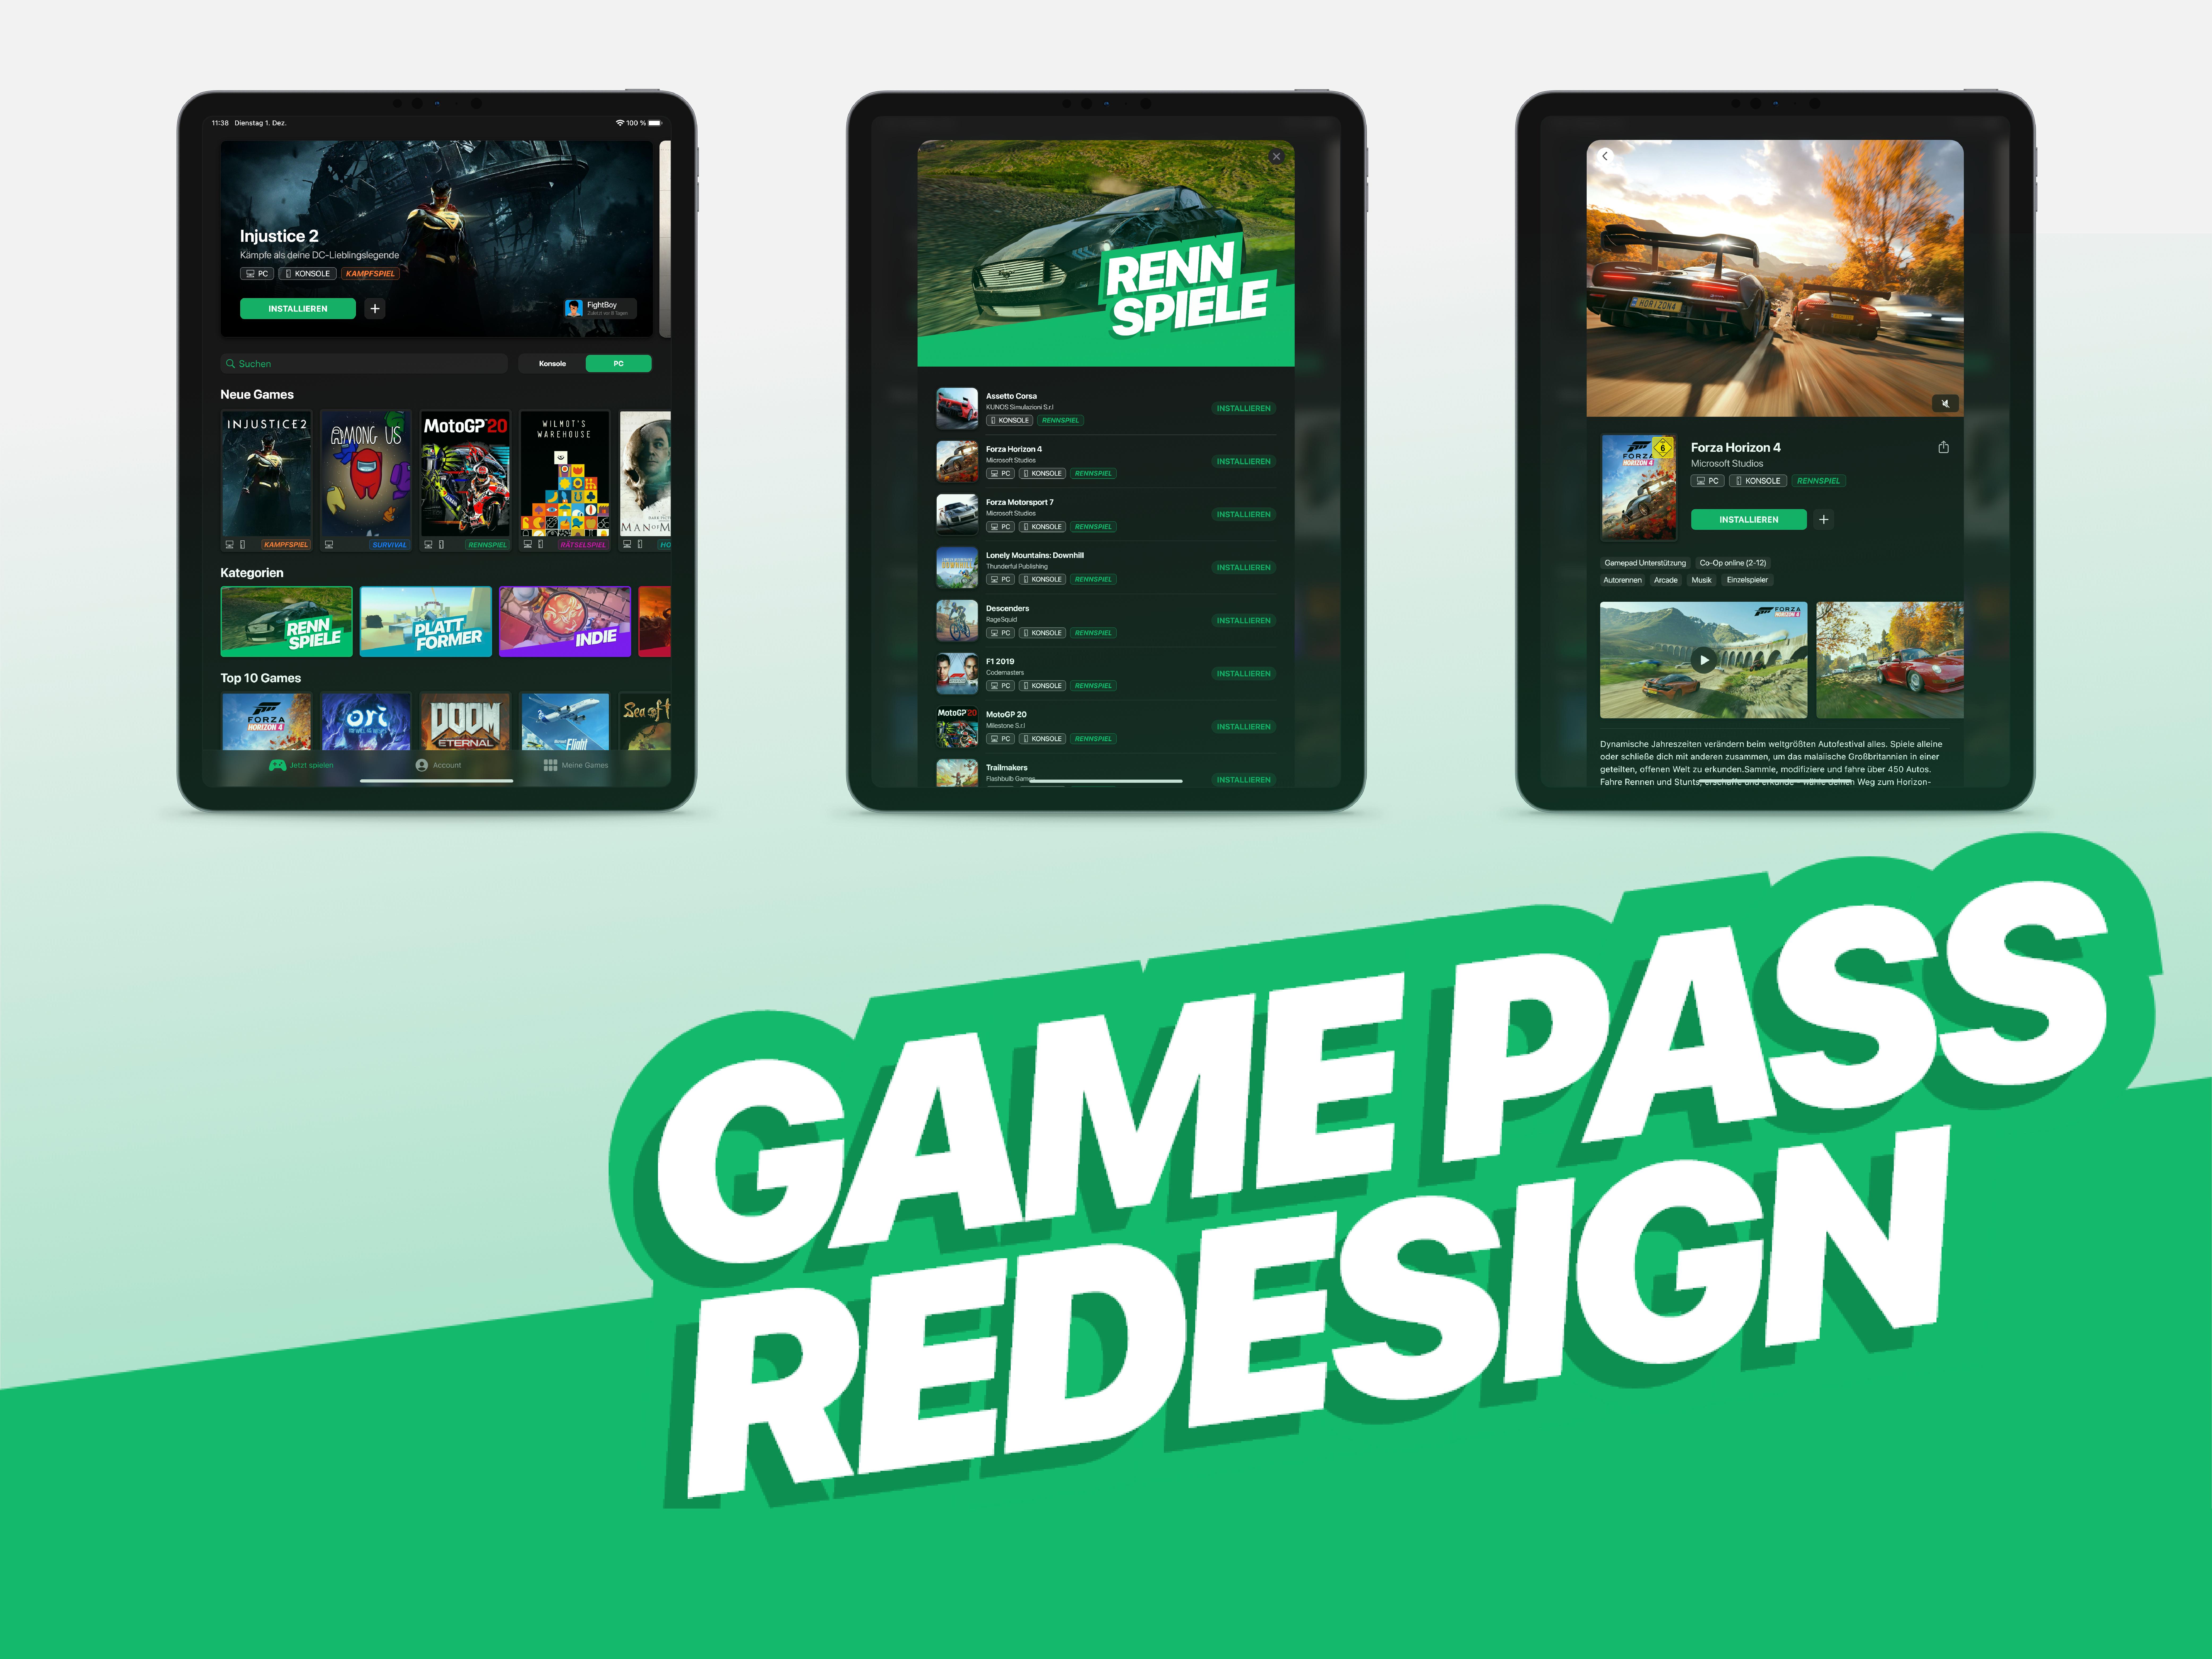 Game Pass Redesign